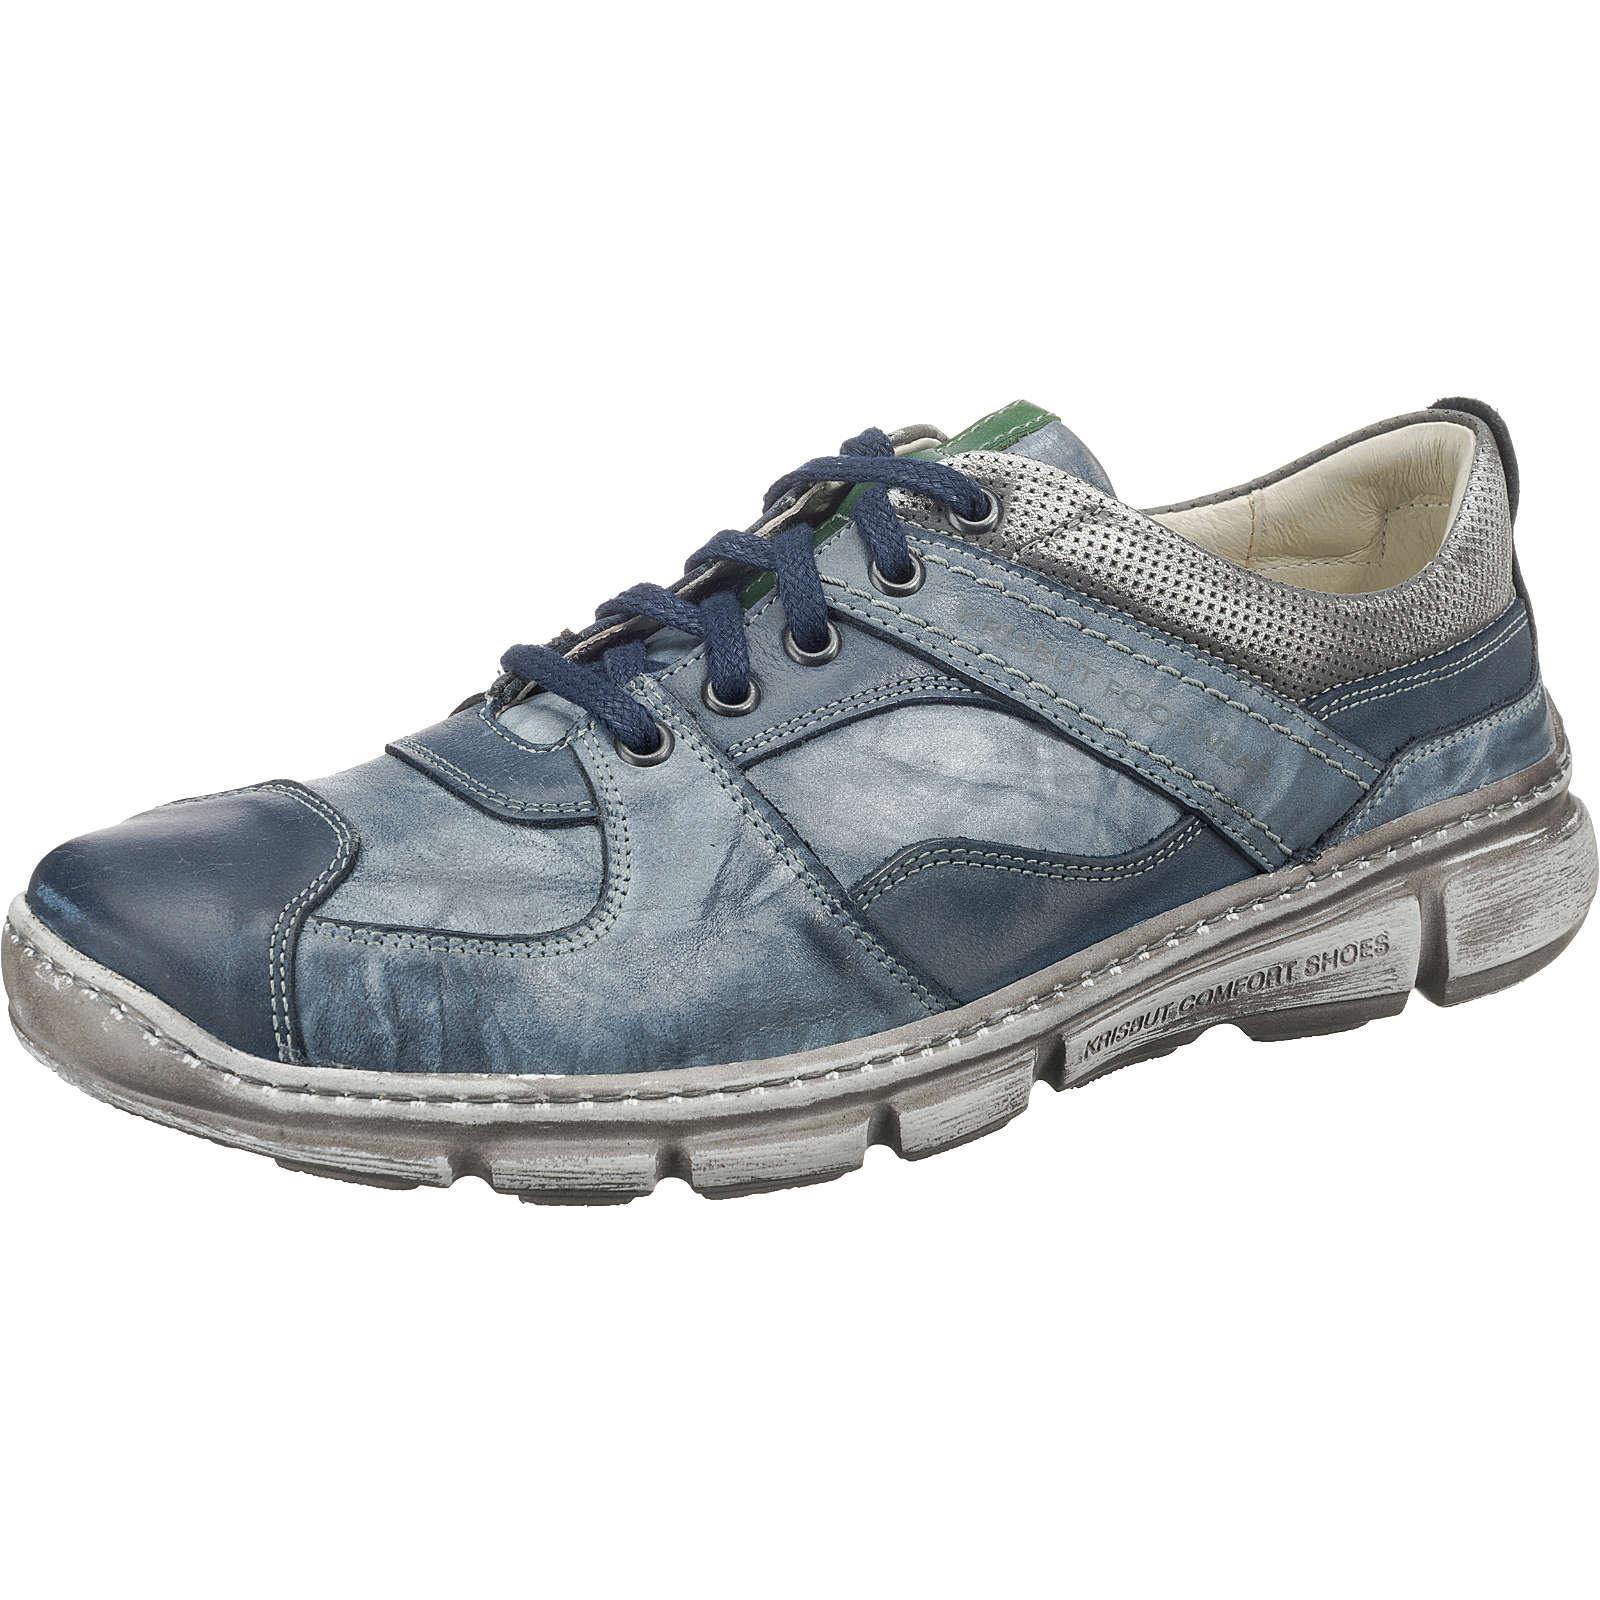 Krisbut 5068-2-1 Schnürschuhe blau Herren Gr. 45